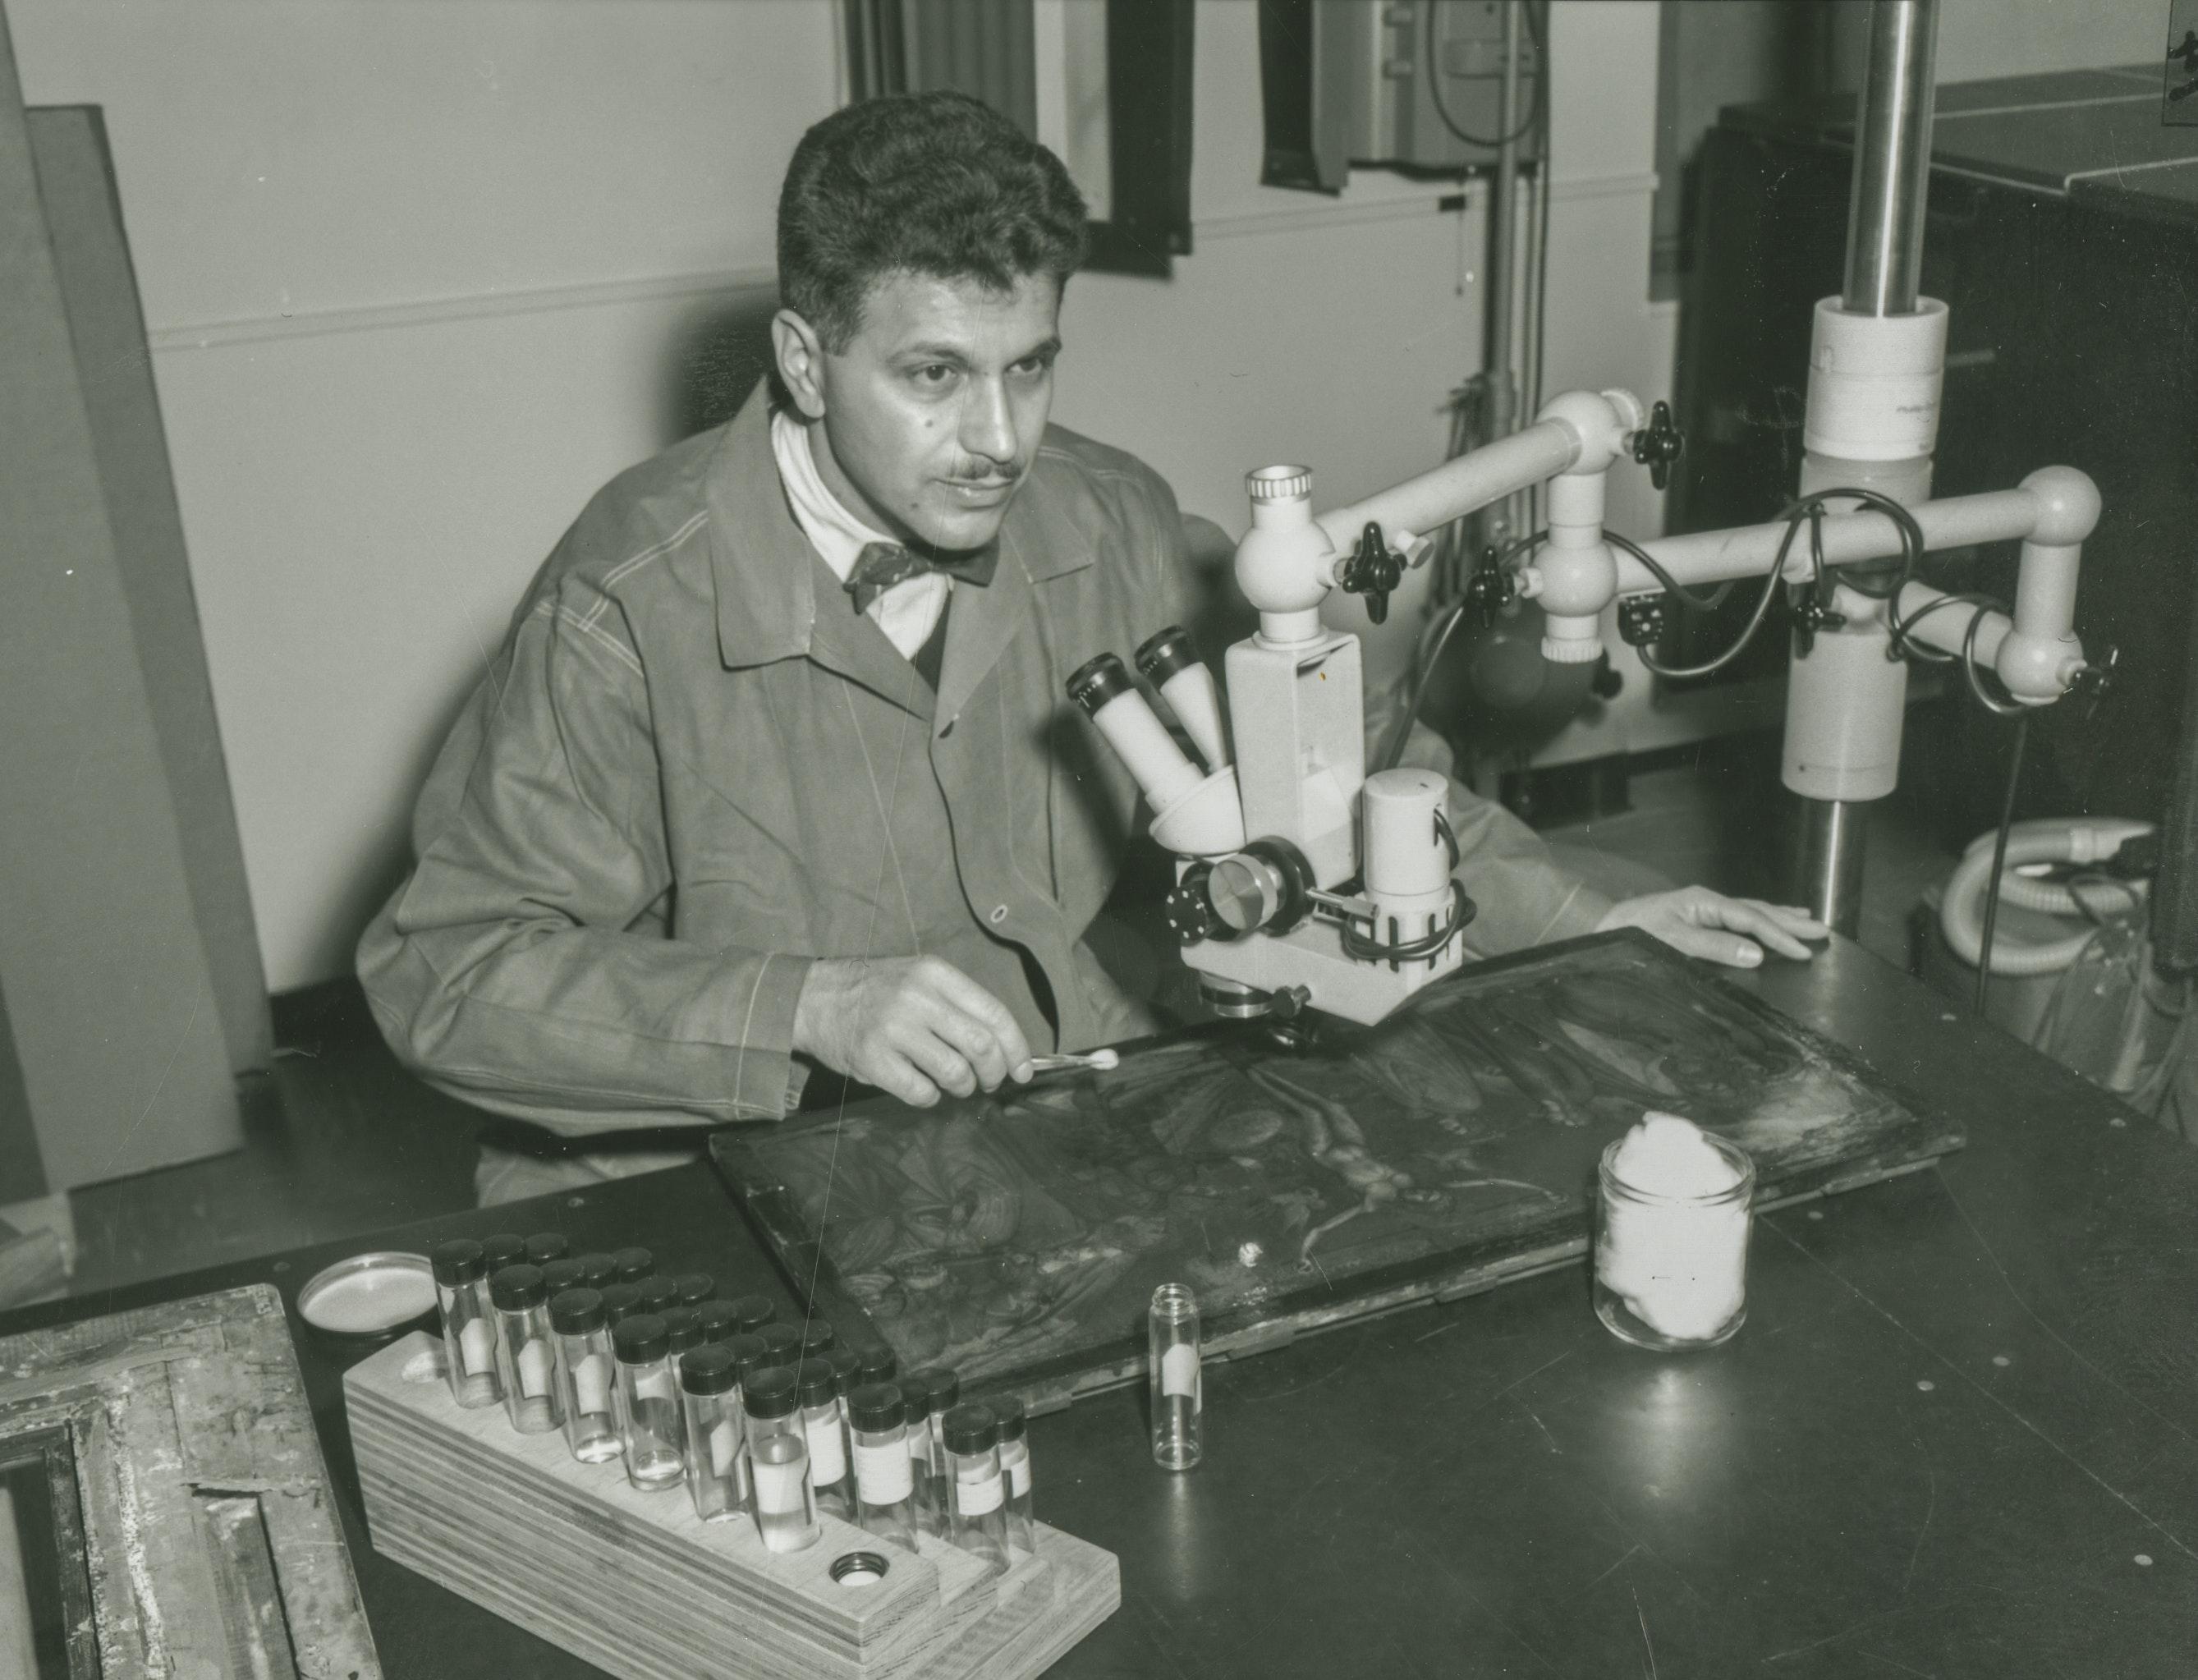 01 Pomerantz At Microscope